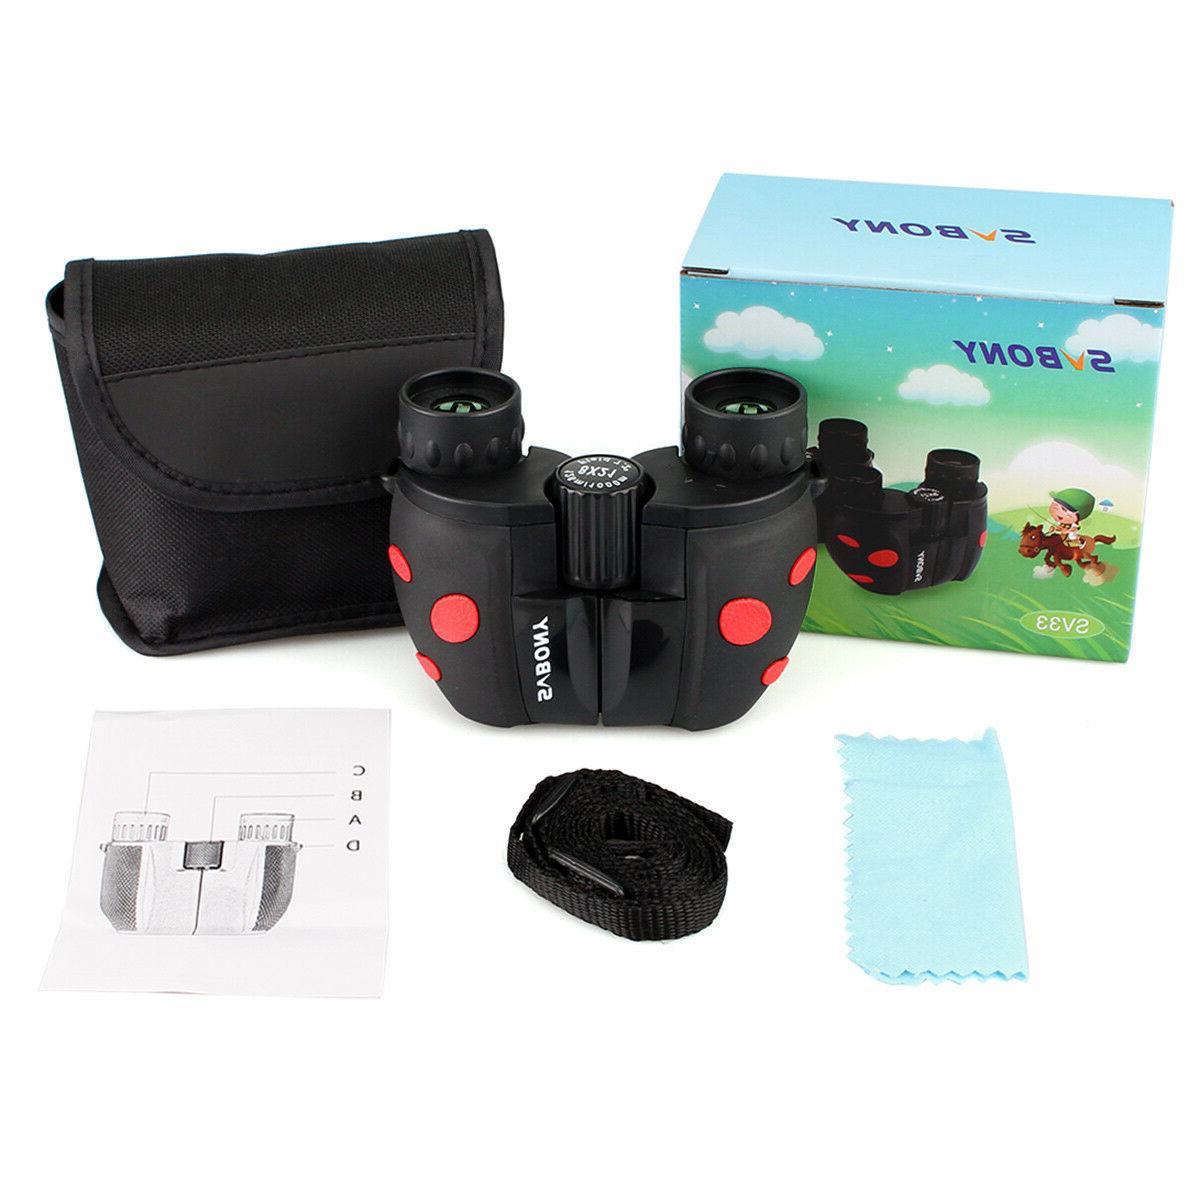 SVBONY Ultra Compact for Children Kids